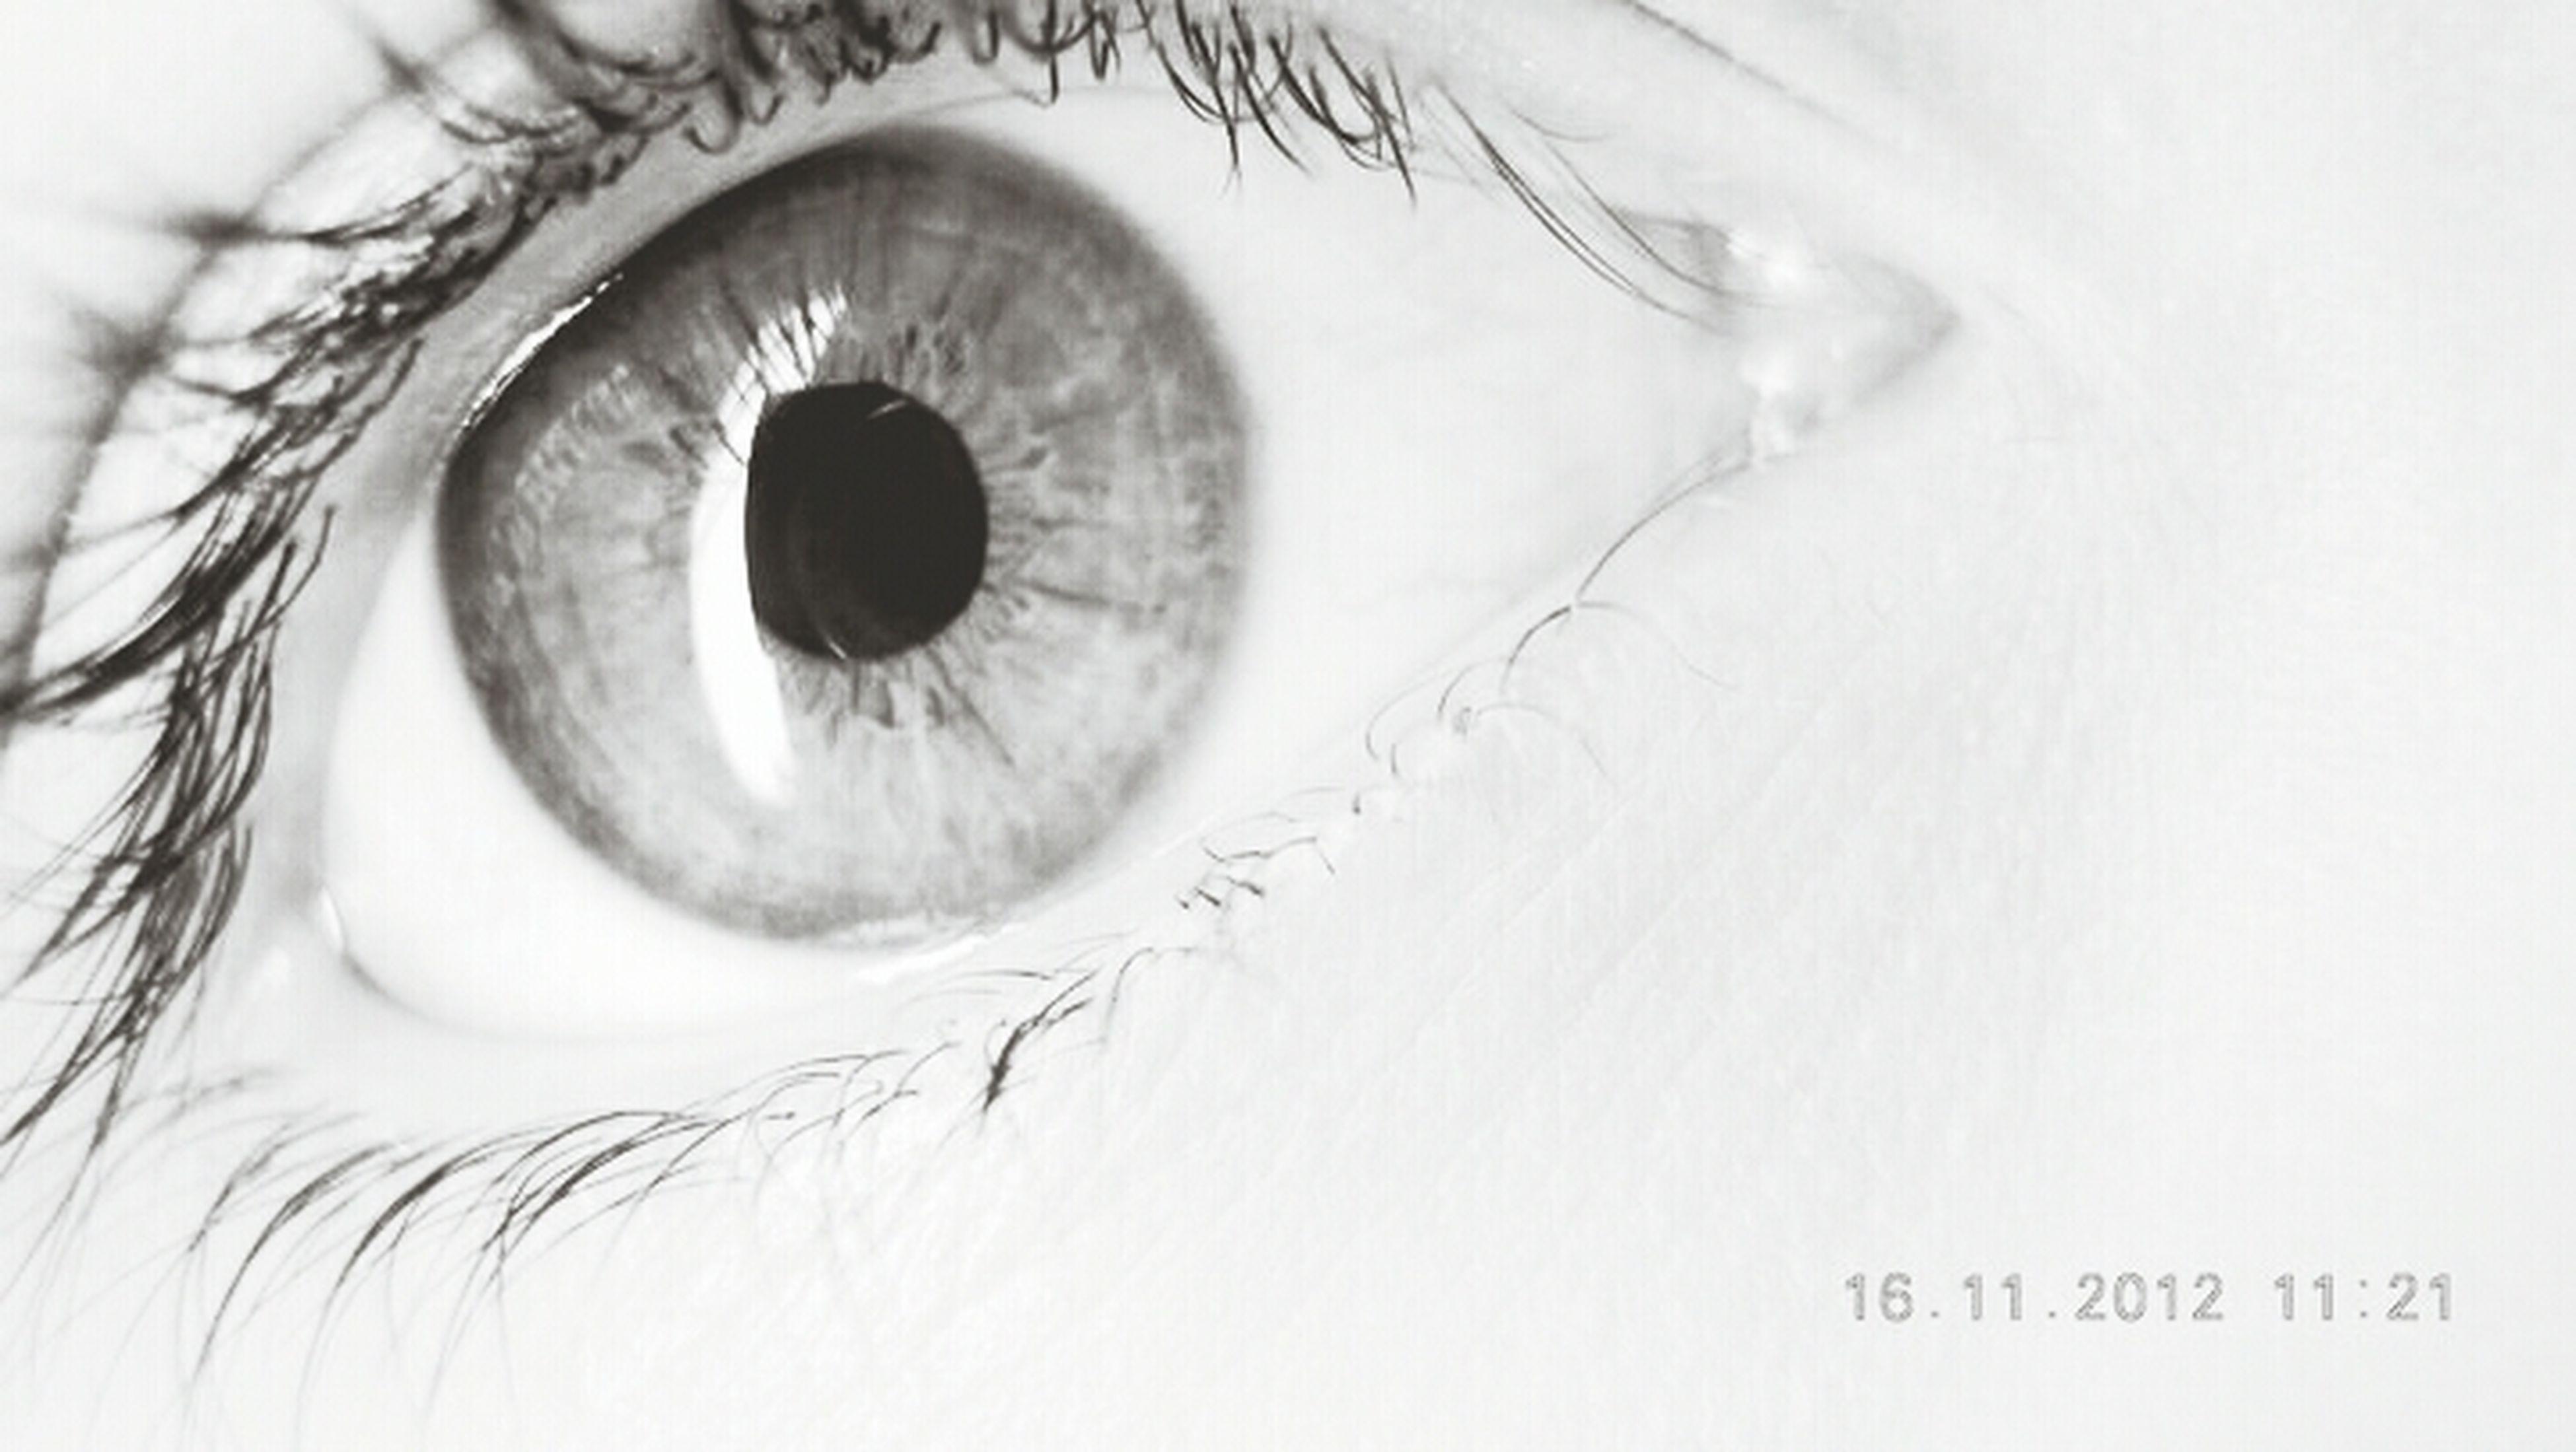 human eye, close-up, indoors, eyesight, extreme close-up, eyelash, sensory perception, part of, white background, human skin, detail, studio shot, eyeball, circle, human face, looking at camera, full frame